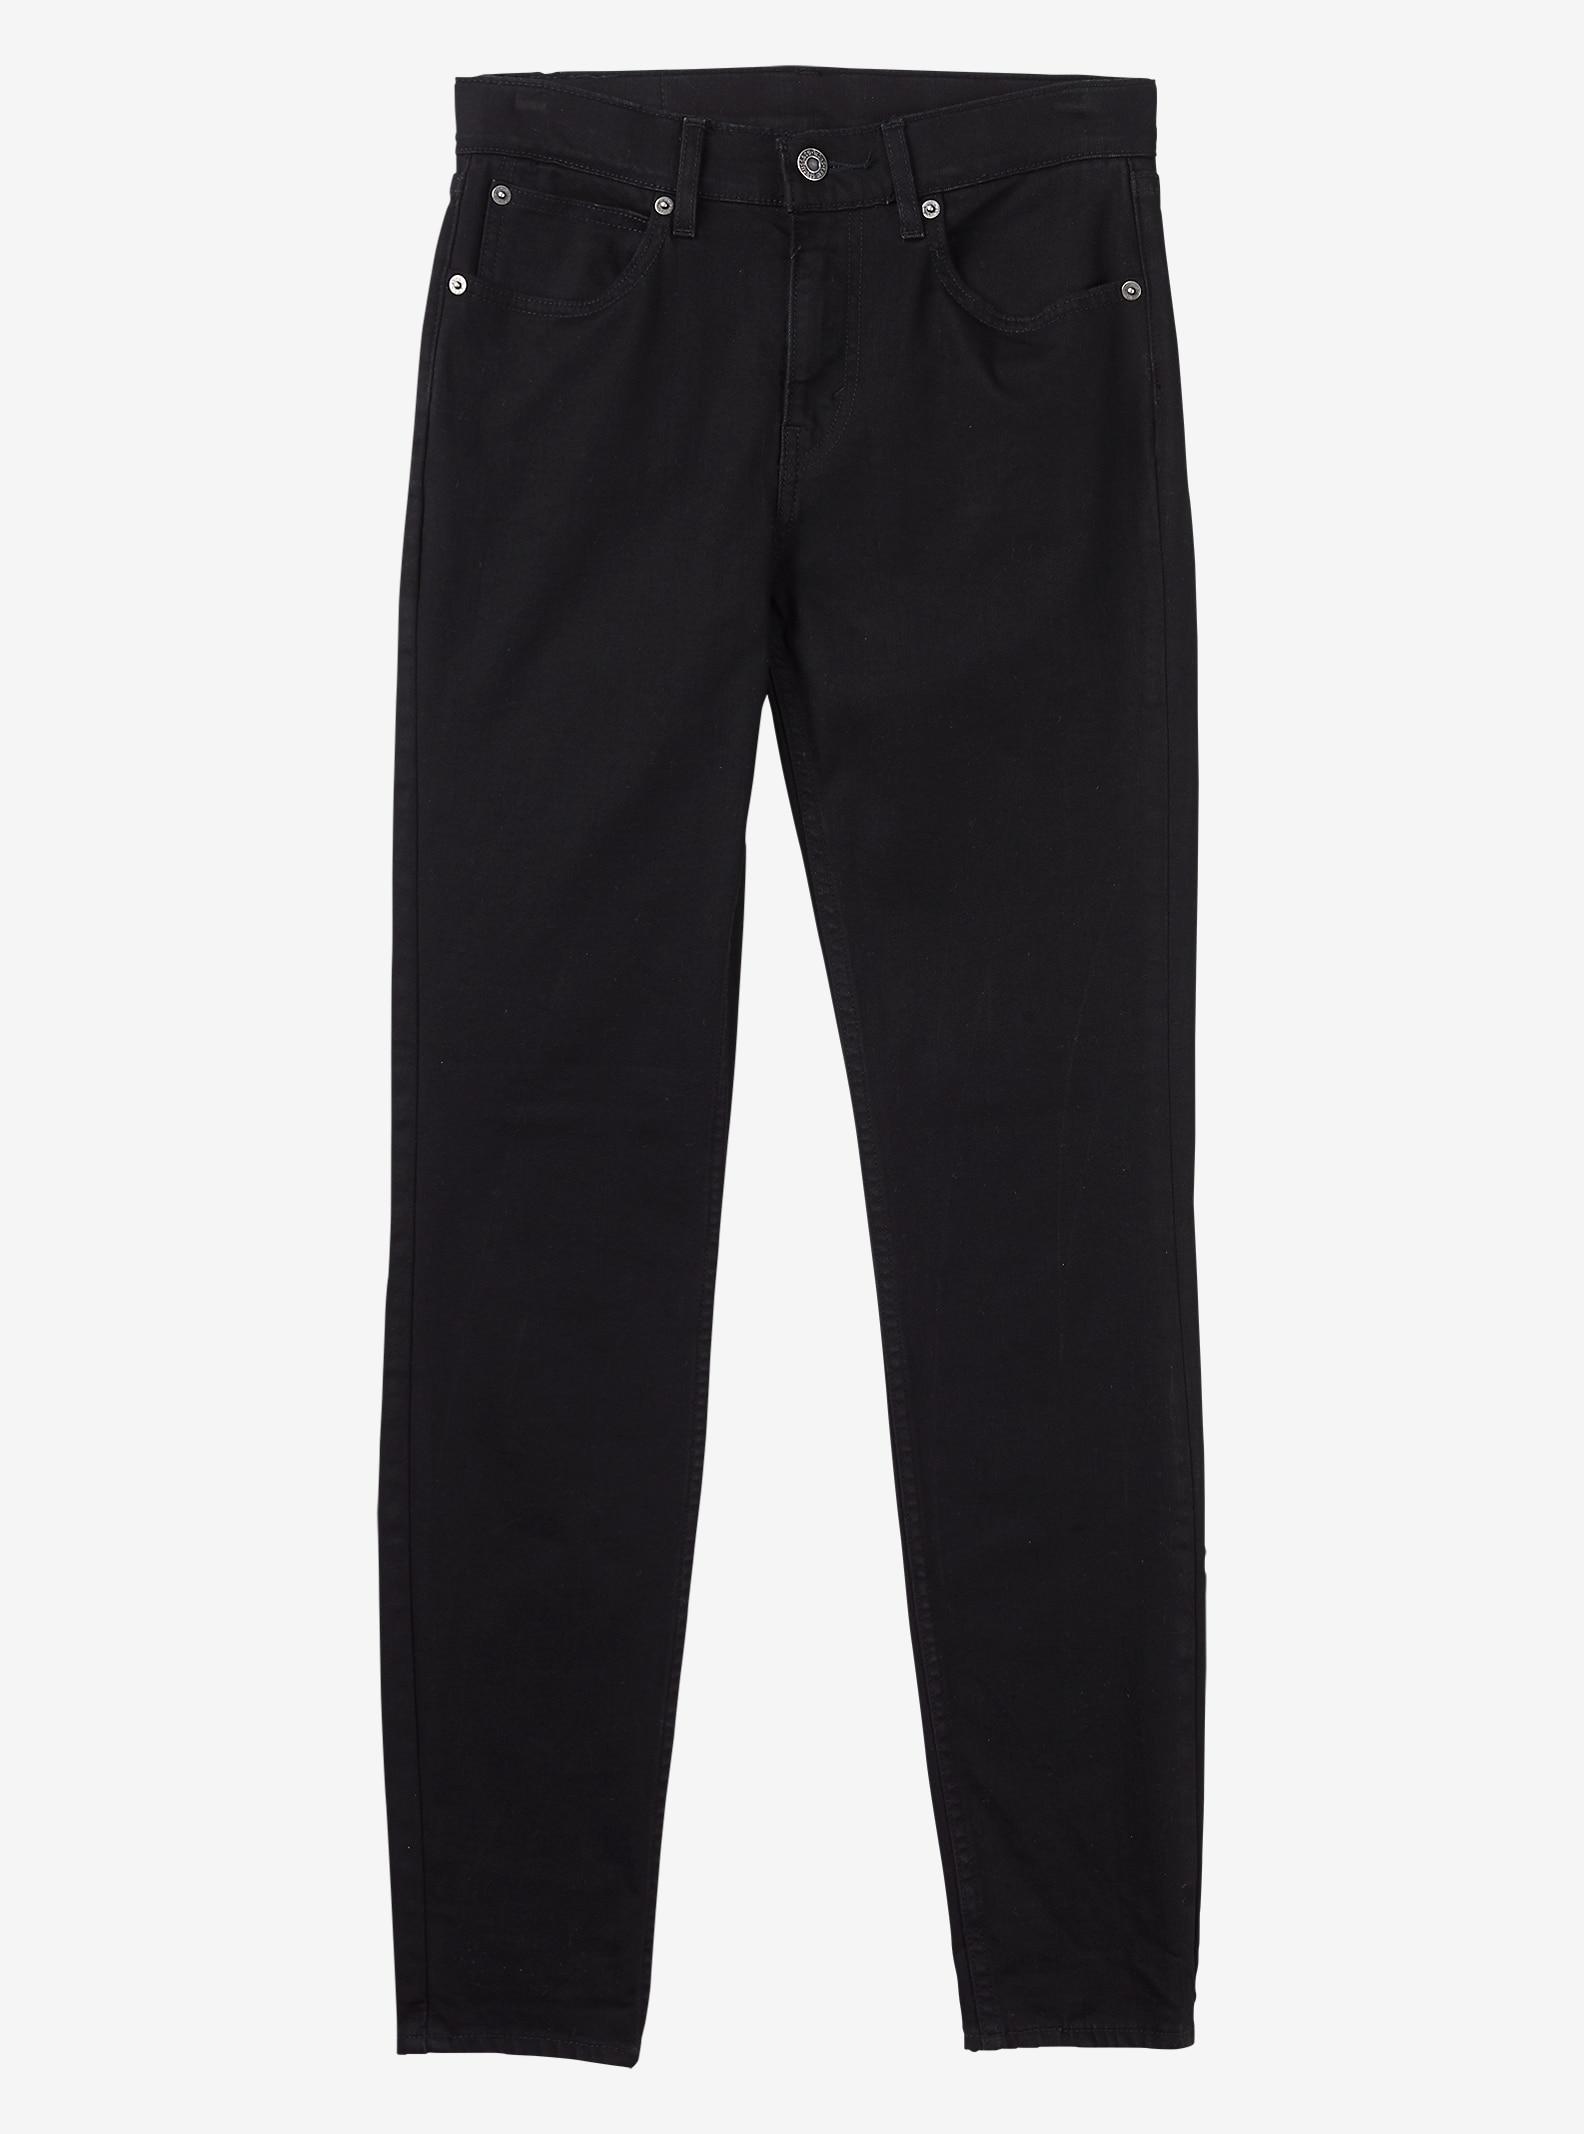 Women's Levi's® Commuter™ High Rise Skinny Jean shown in Black